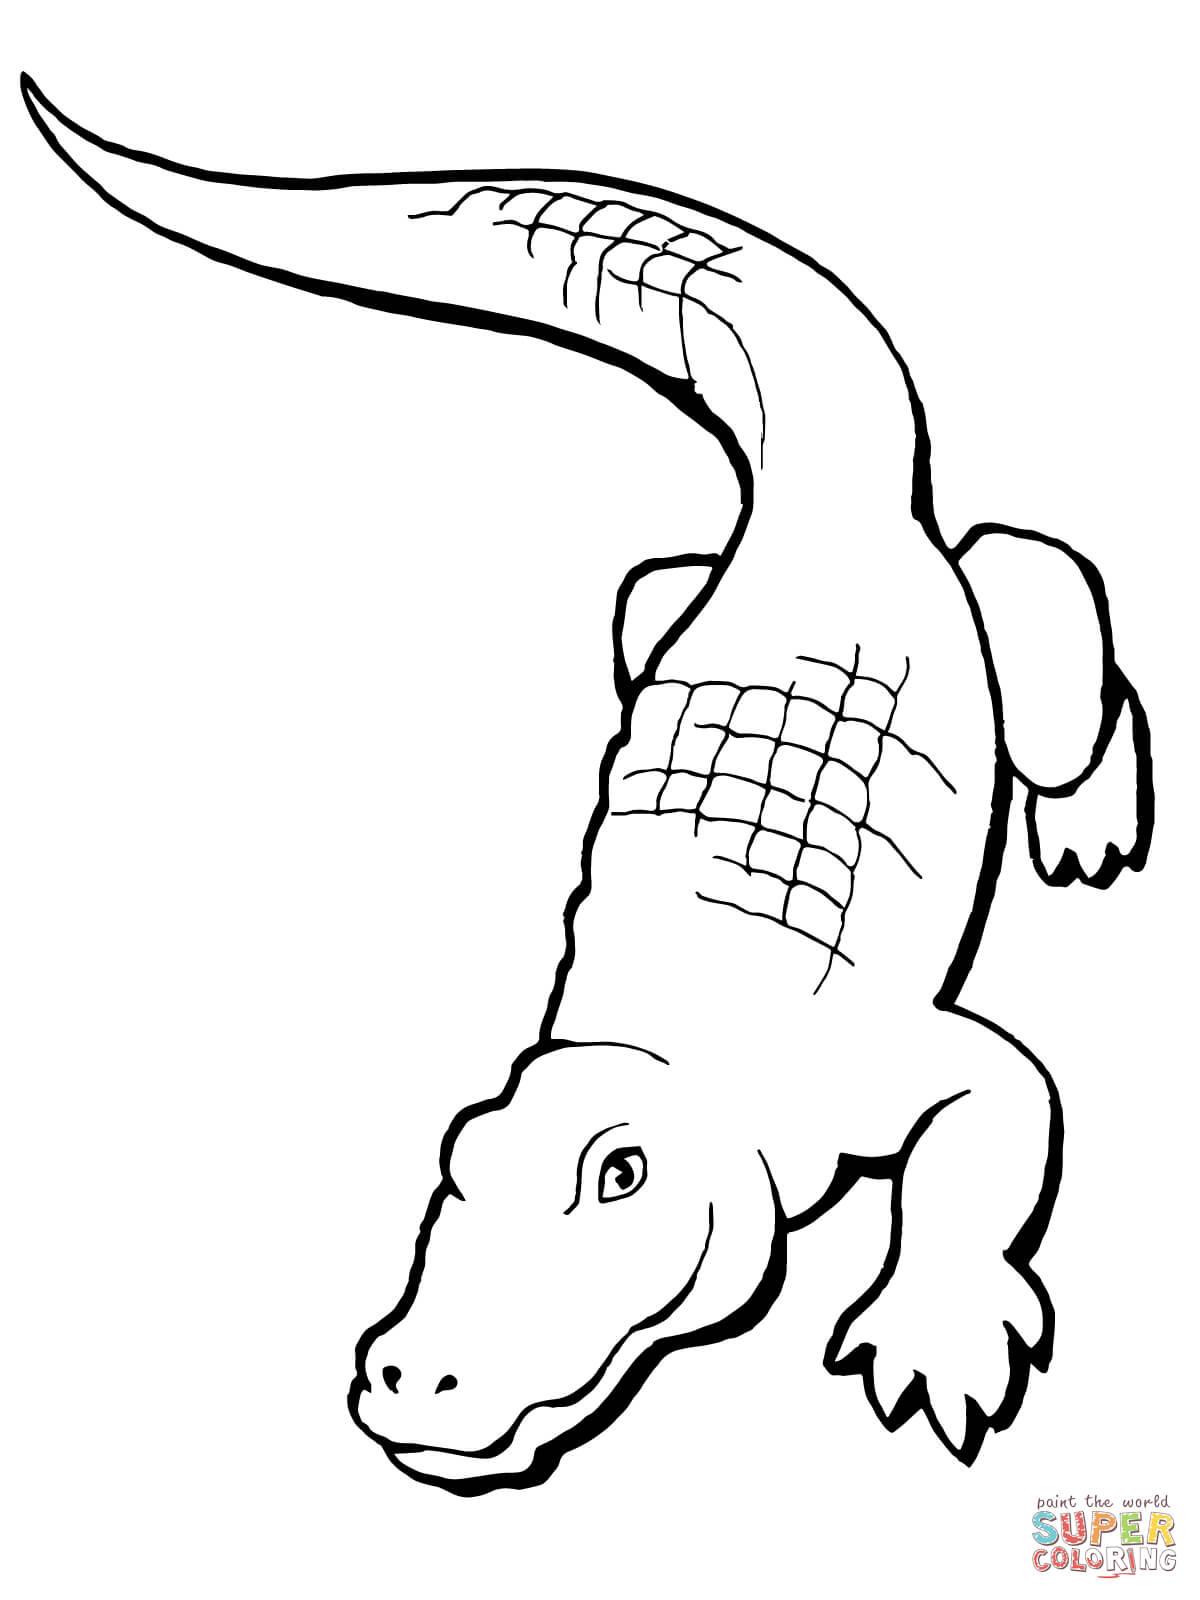 Realistic Alligator Drawing : realistic, alligator, drawing, Realistic, Alligator, Coloring, Printable, Pages